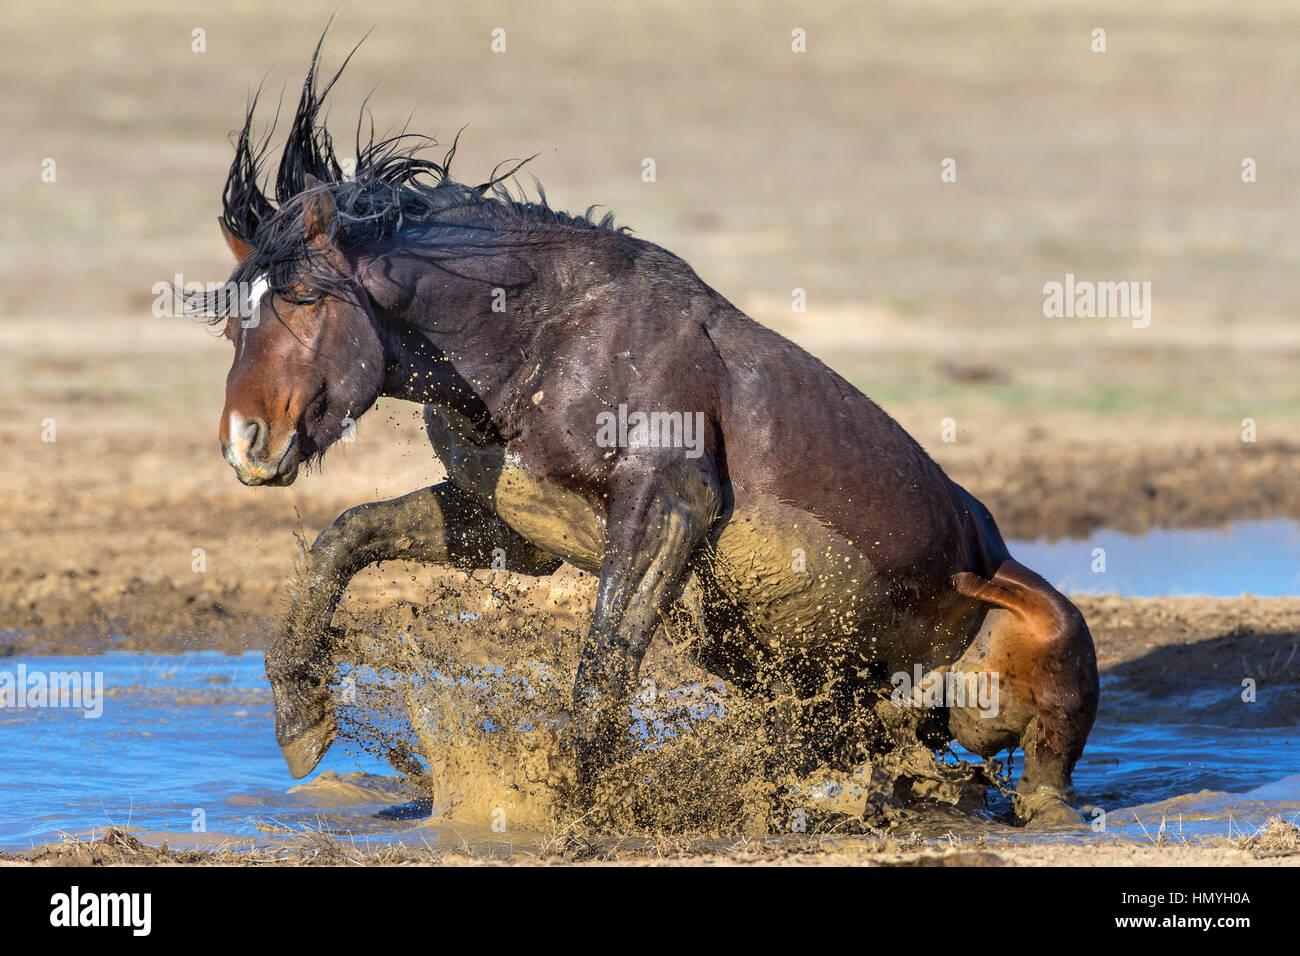 Stock Photo : Wild Mustang playing in the mud (Equus ferus caballus), West Desert, Utah, USA, North America - Stock Image